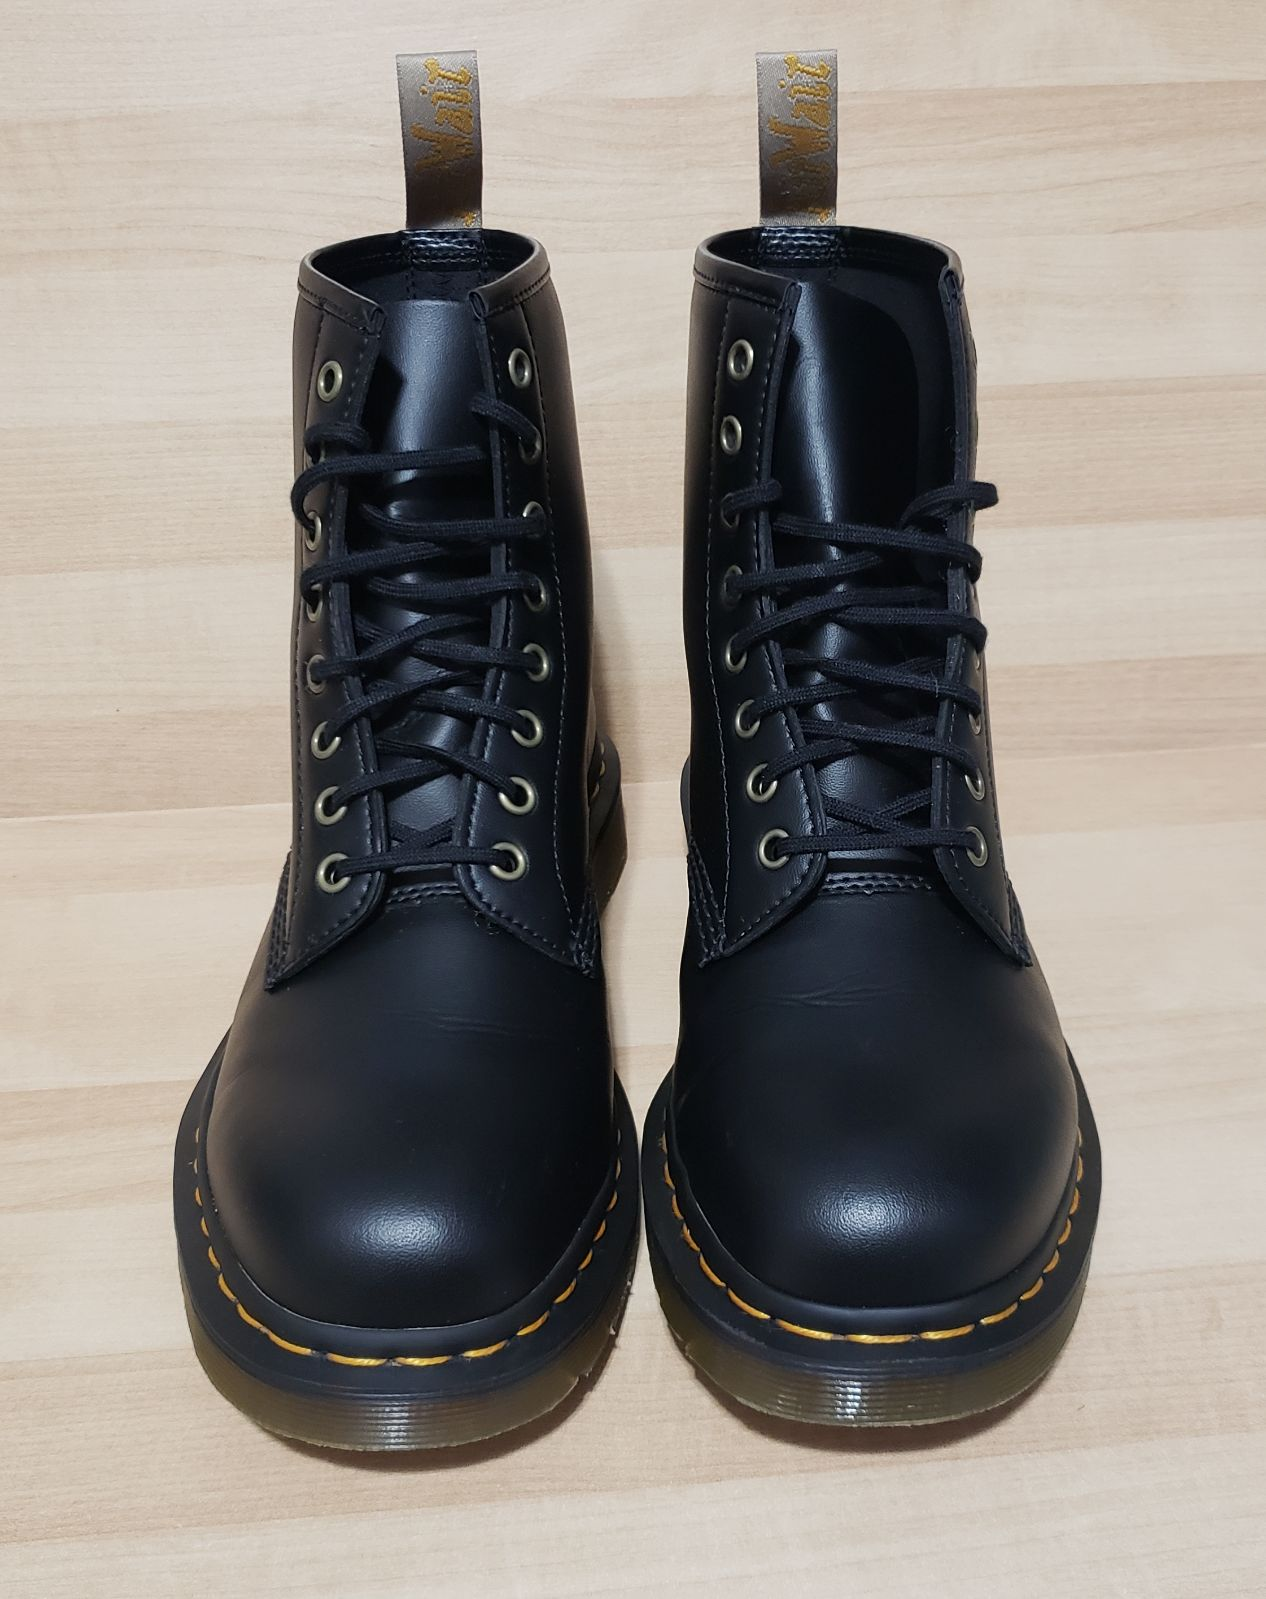 Dr Martens 1460 Vegan mens 10 Black boot